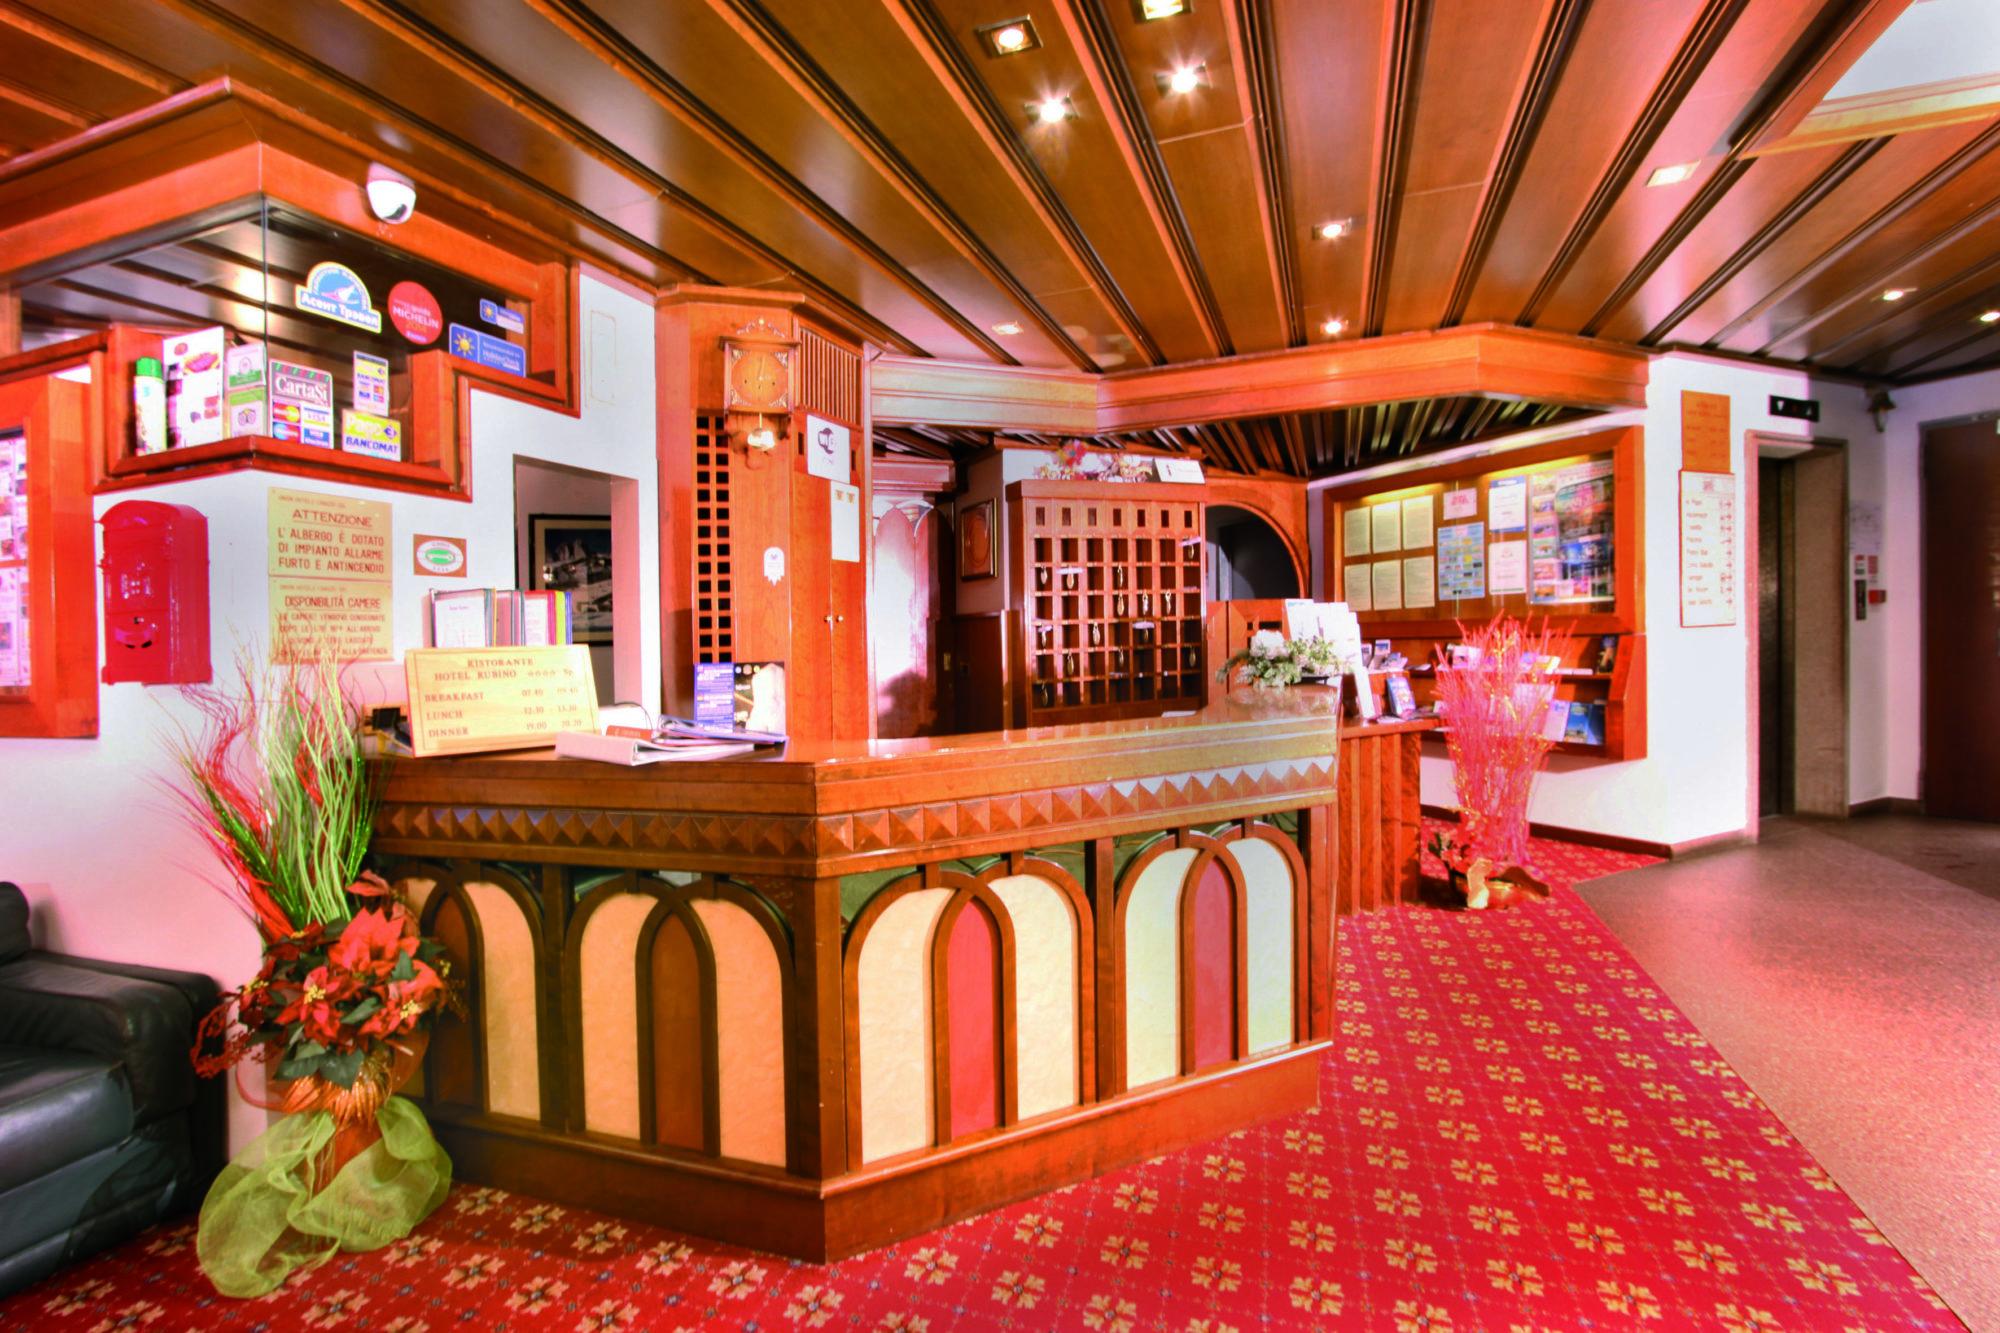 7 Hotel Rubino - Reception